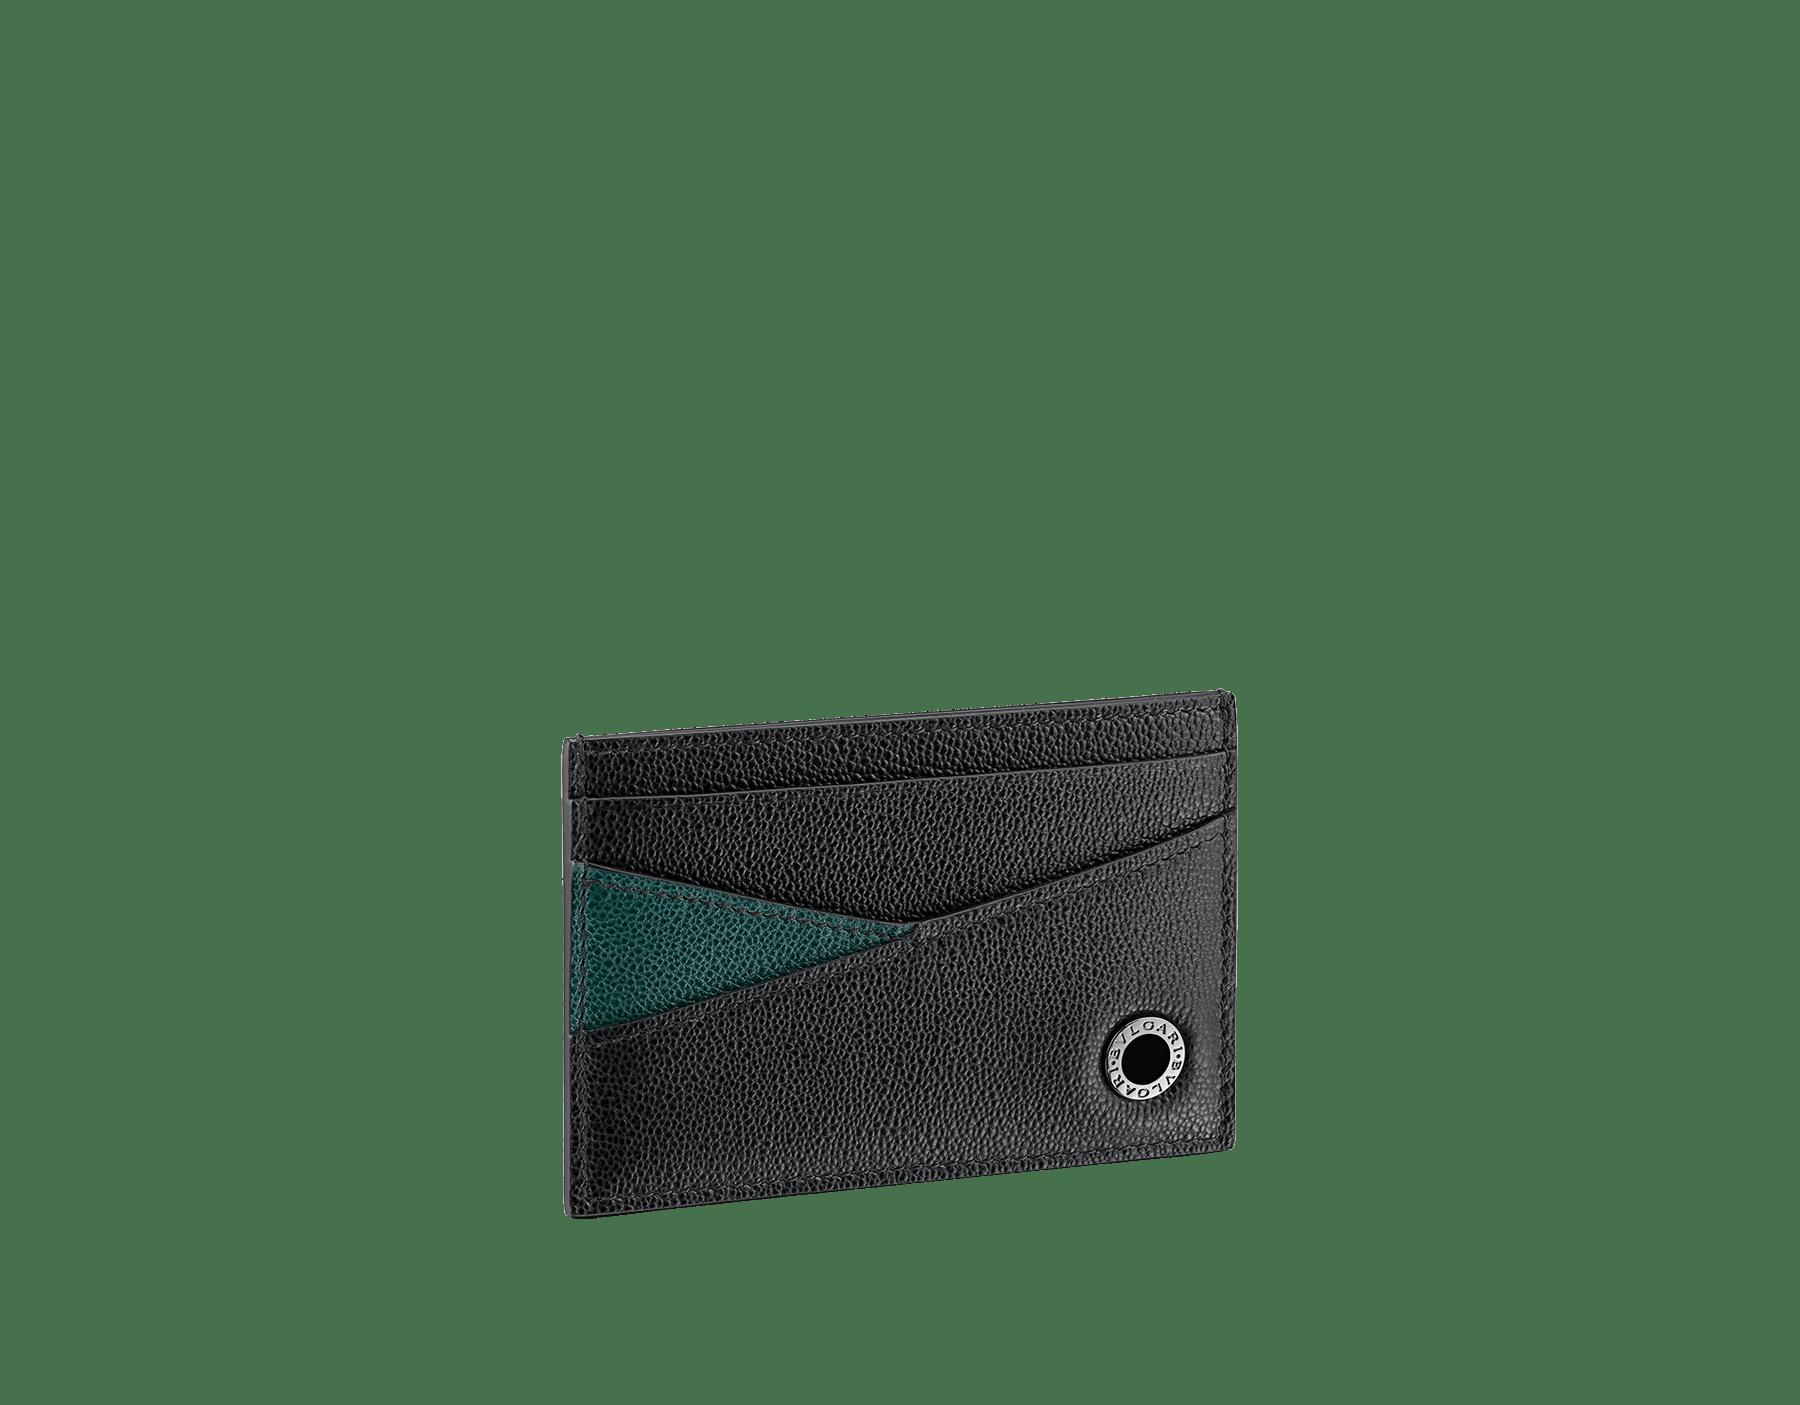 """BVLGARI BVLGARI"" men's card holder in black and Forest Emerald green ""Urban"" grain calf leather. Iconic logo embellishment in dark ruthenium-plated brass with black enameling. BBM-CCHOLDERASYM image 1"